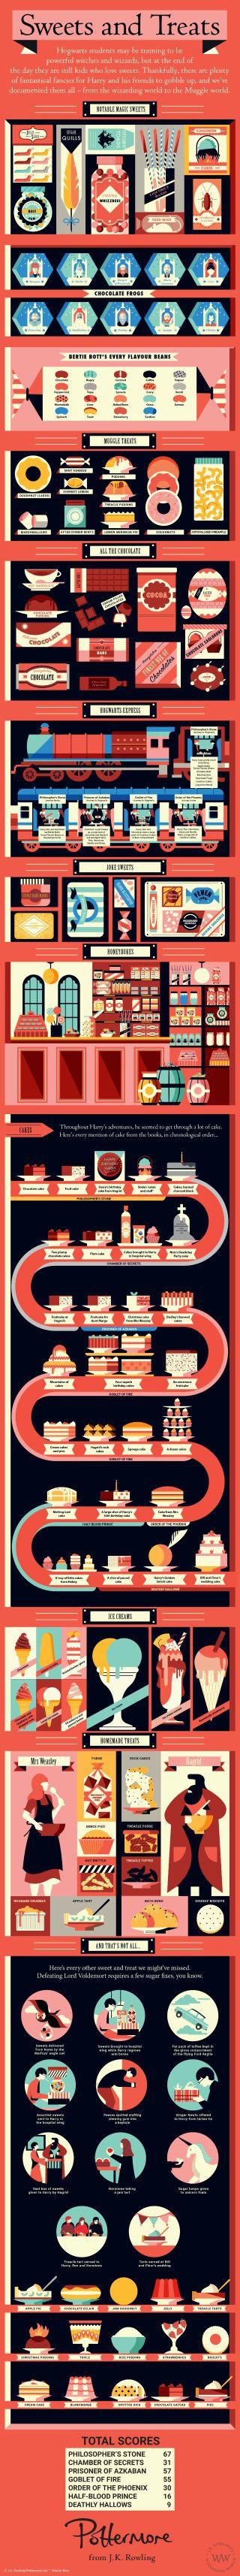 Dolci e Treats infografica